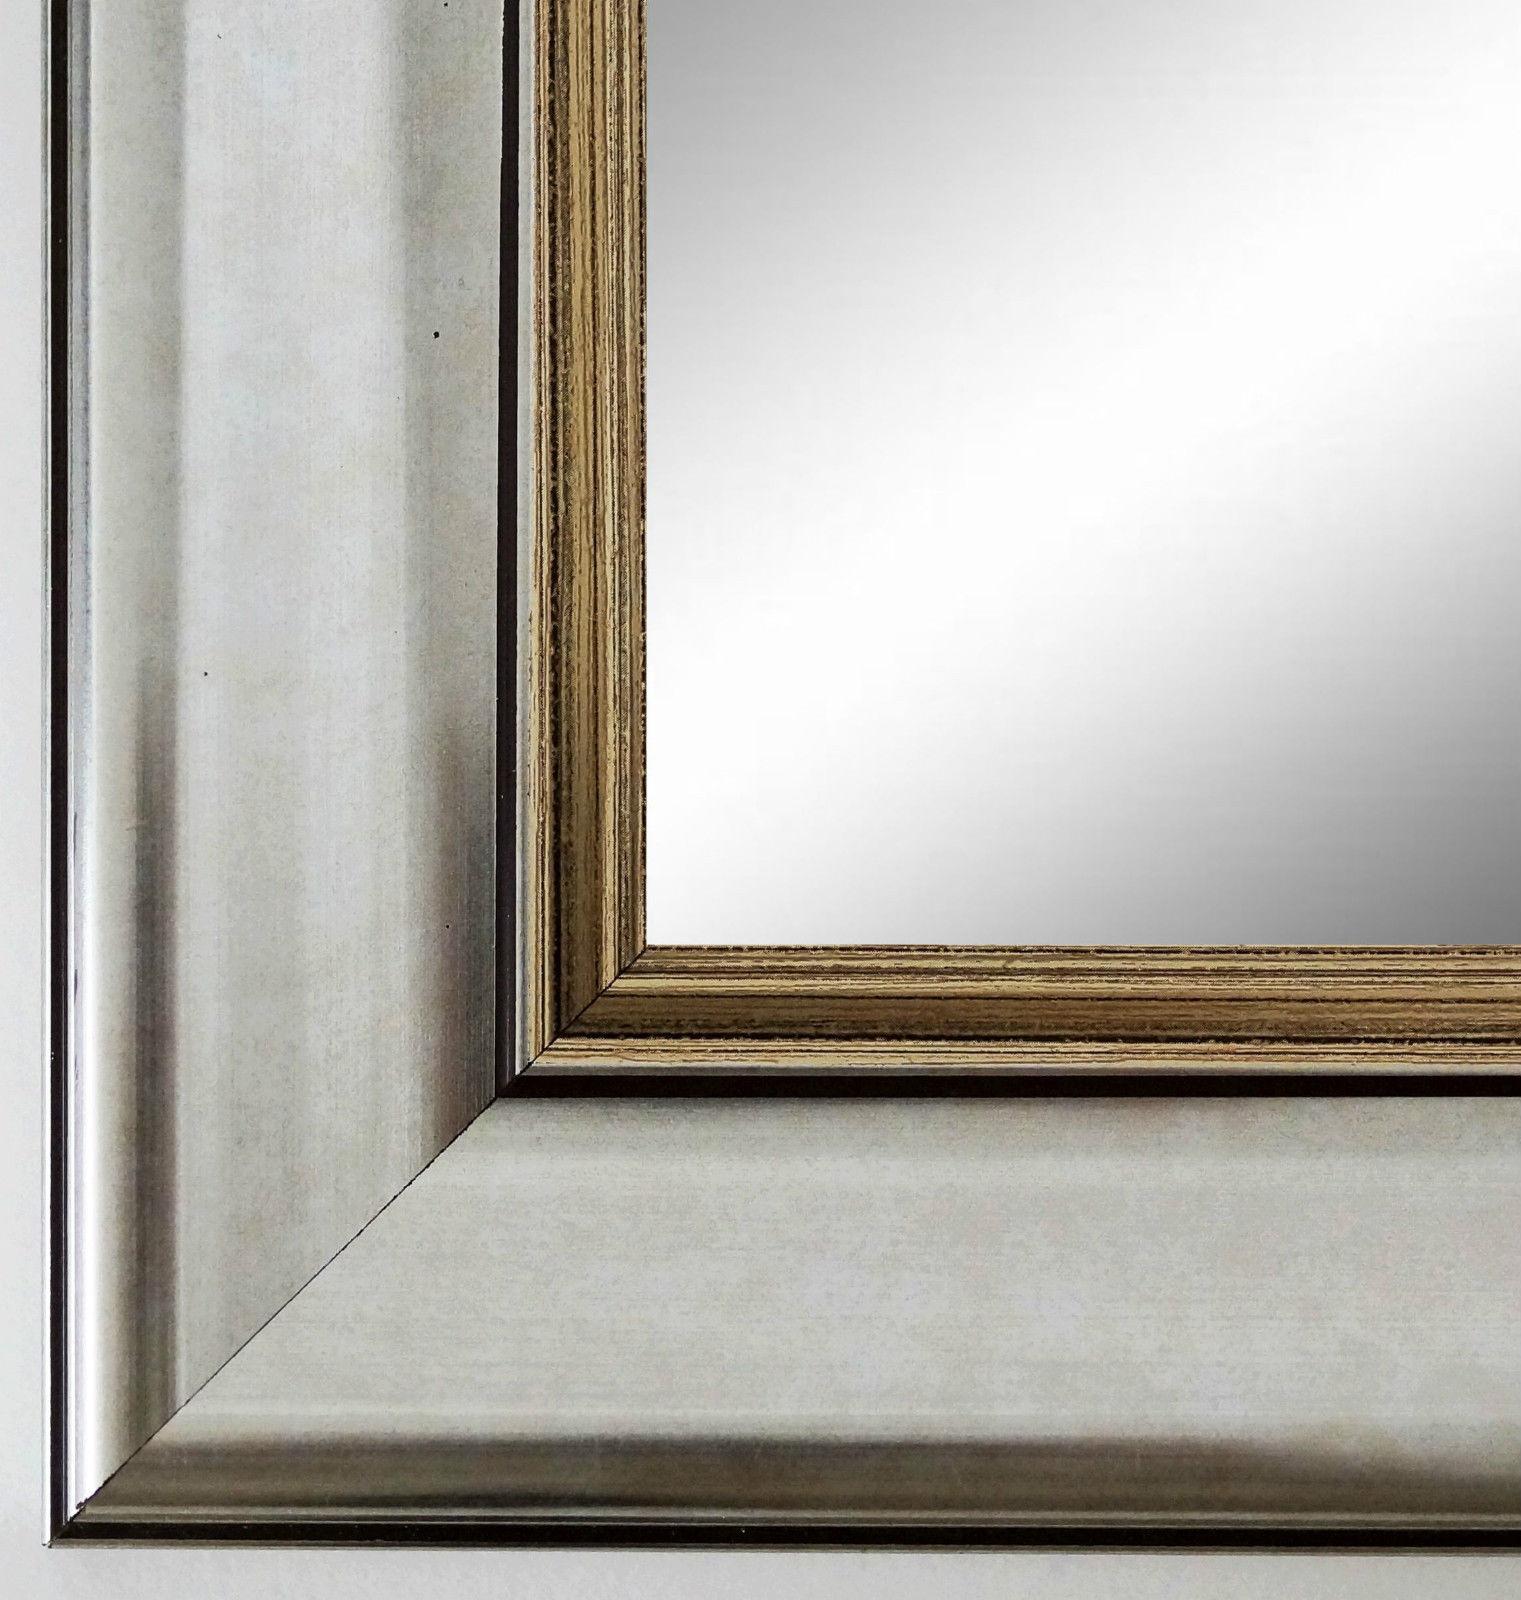 Spiegel Flur wandspiegel silber antik spiegel barock bad flur garderobe flensburg